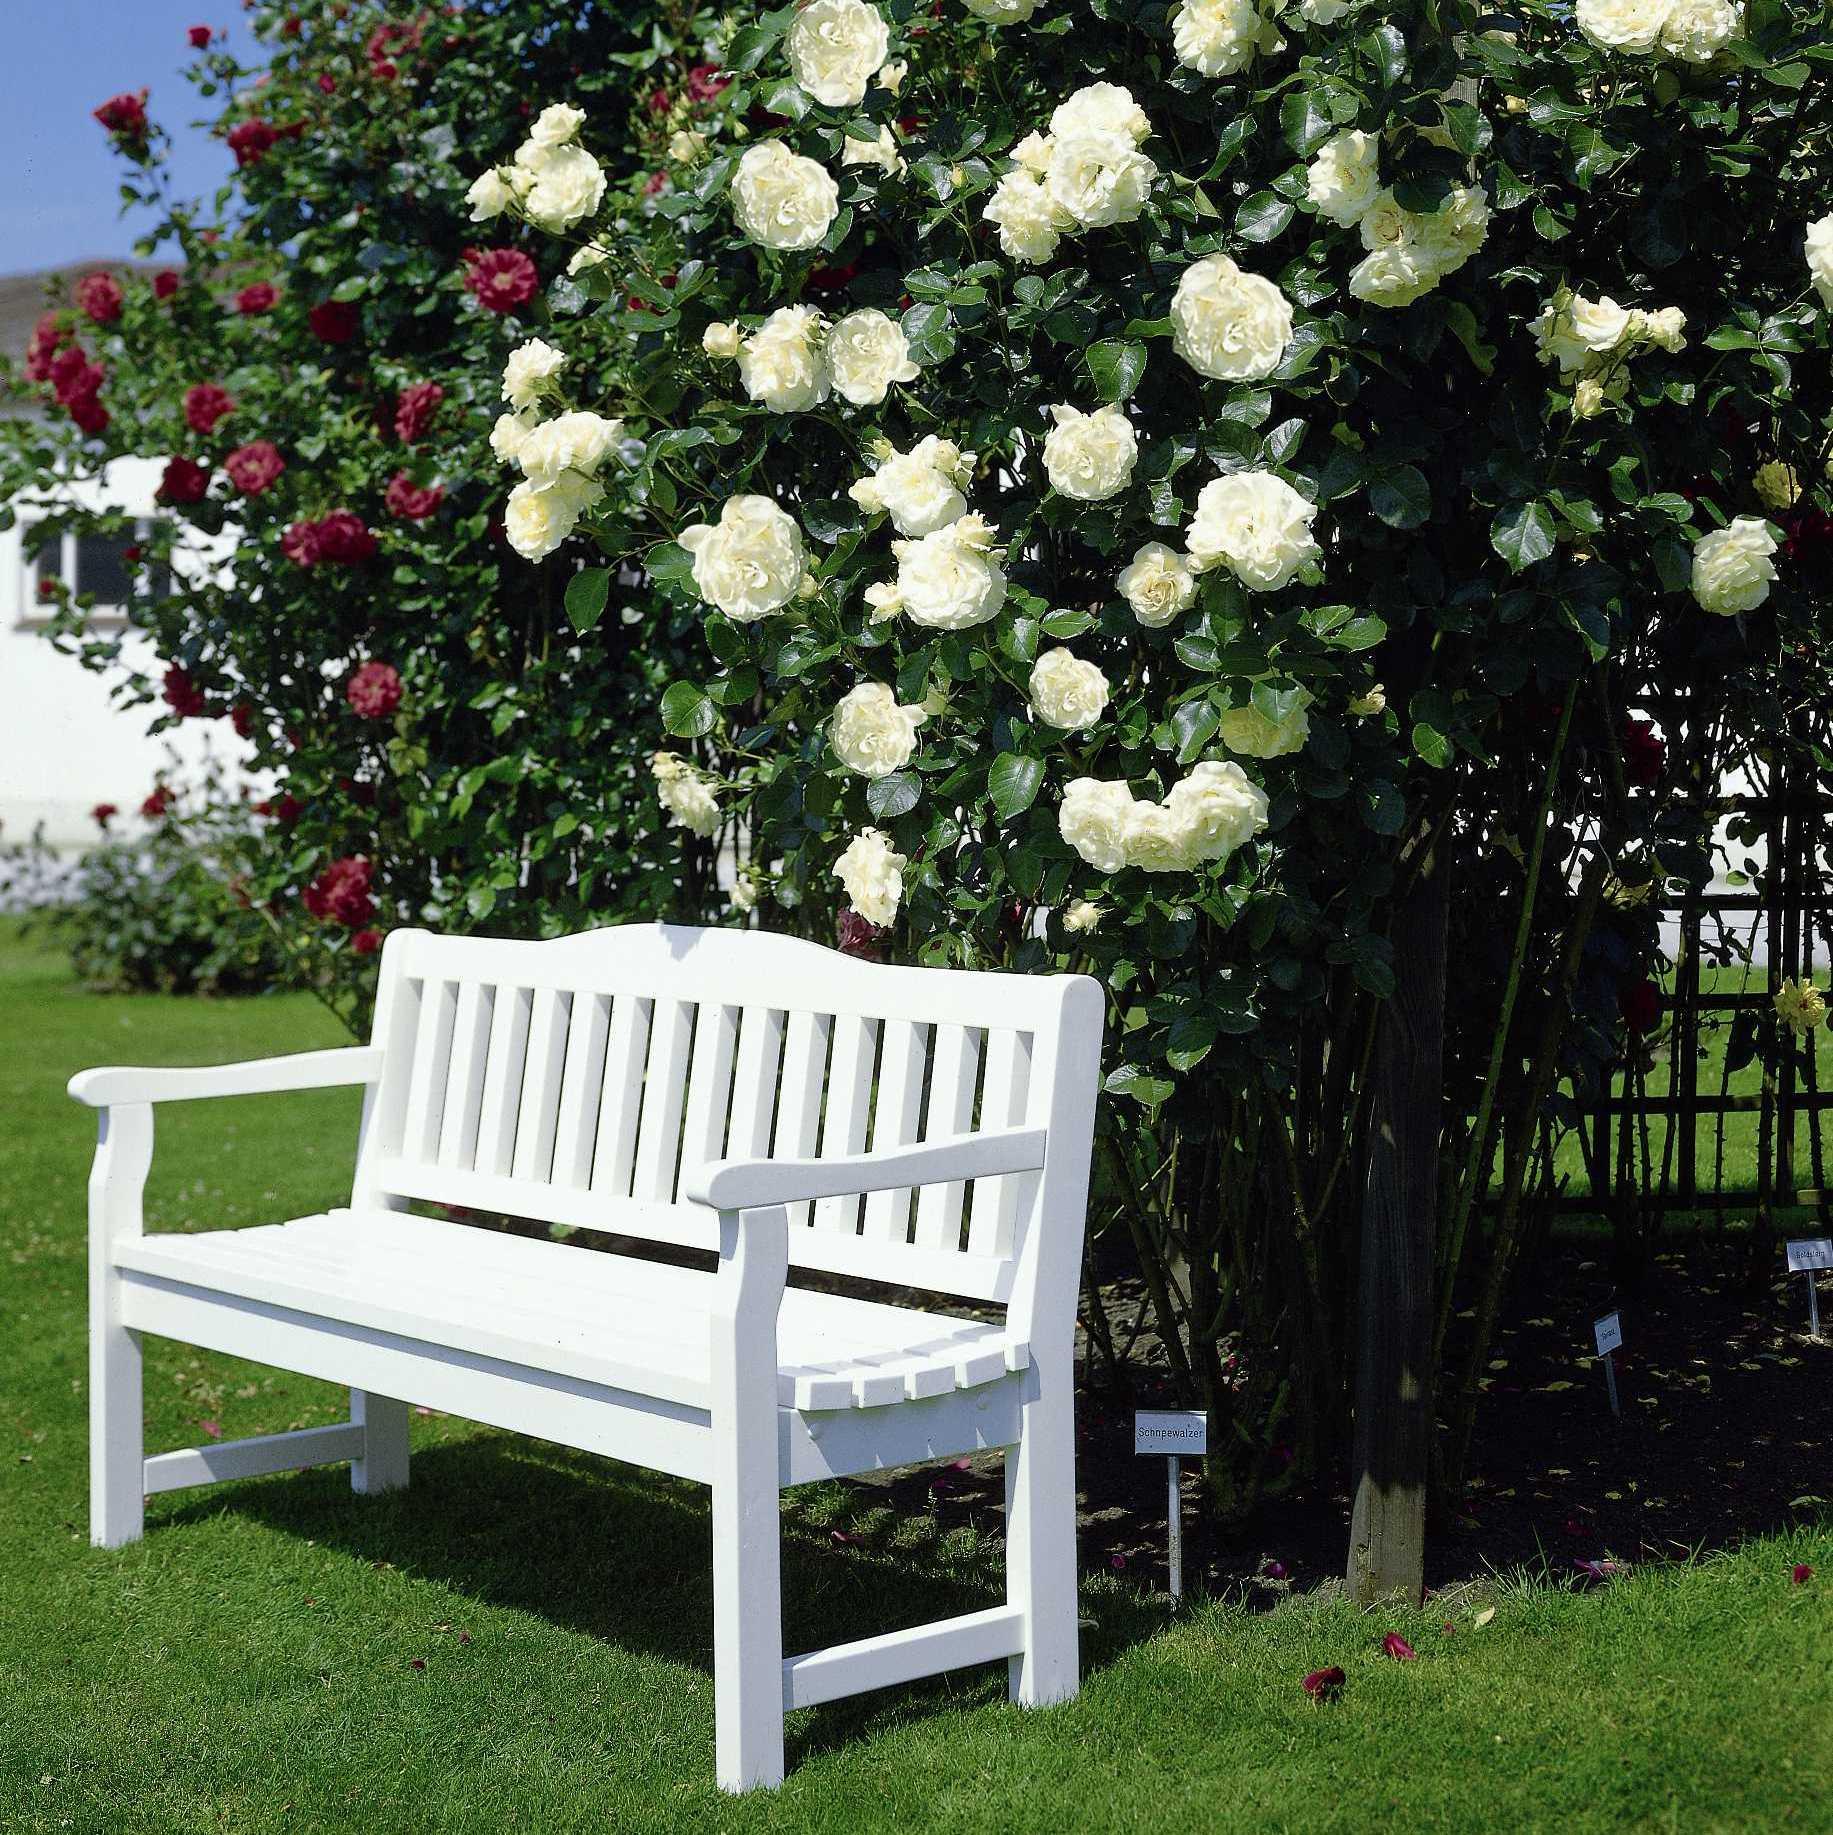 schneewalzer klassische kletterrosen kletterrosen. Black Bedroom Furniture Sets. Home Design Ideas